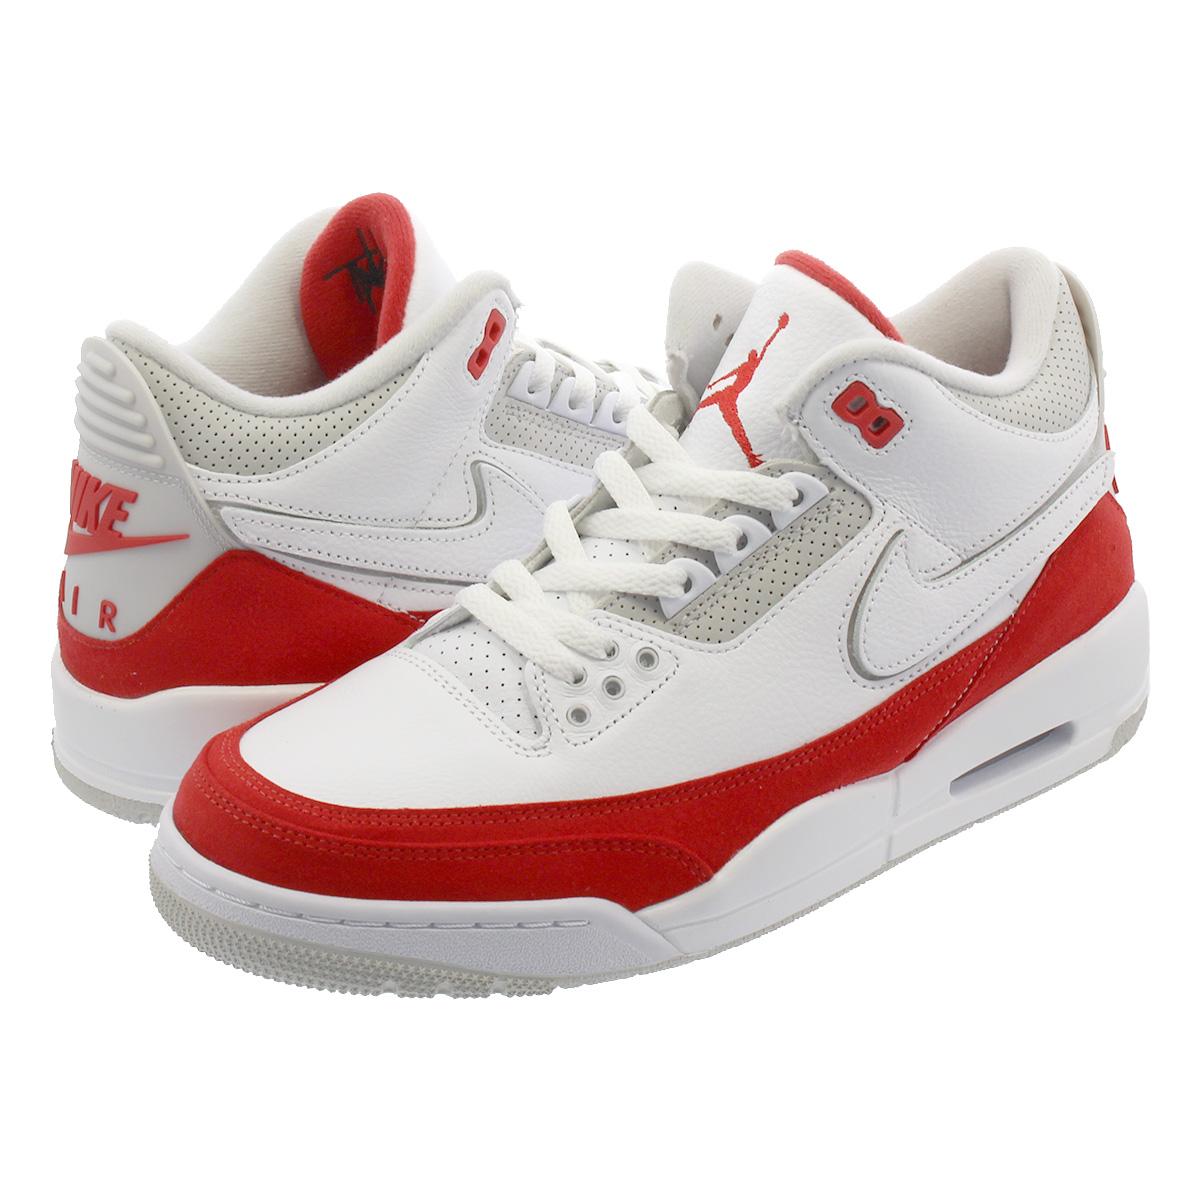 official photos 97a24 a0562 NIKE AIR JORDAN 3 TINKER Nike Air Jordan 3 ティンカー WHITE/UNIVERSITY  RED/NEUTRAL GREY cj0939-100